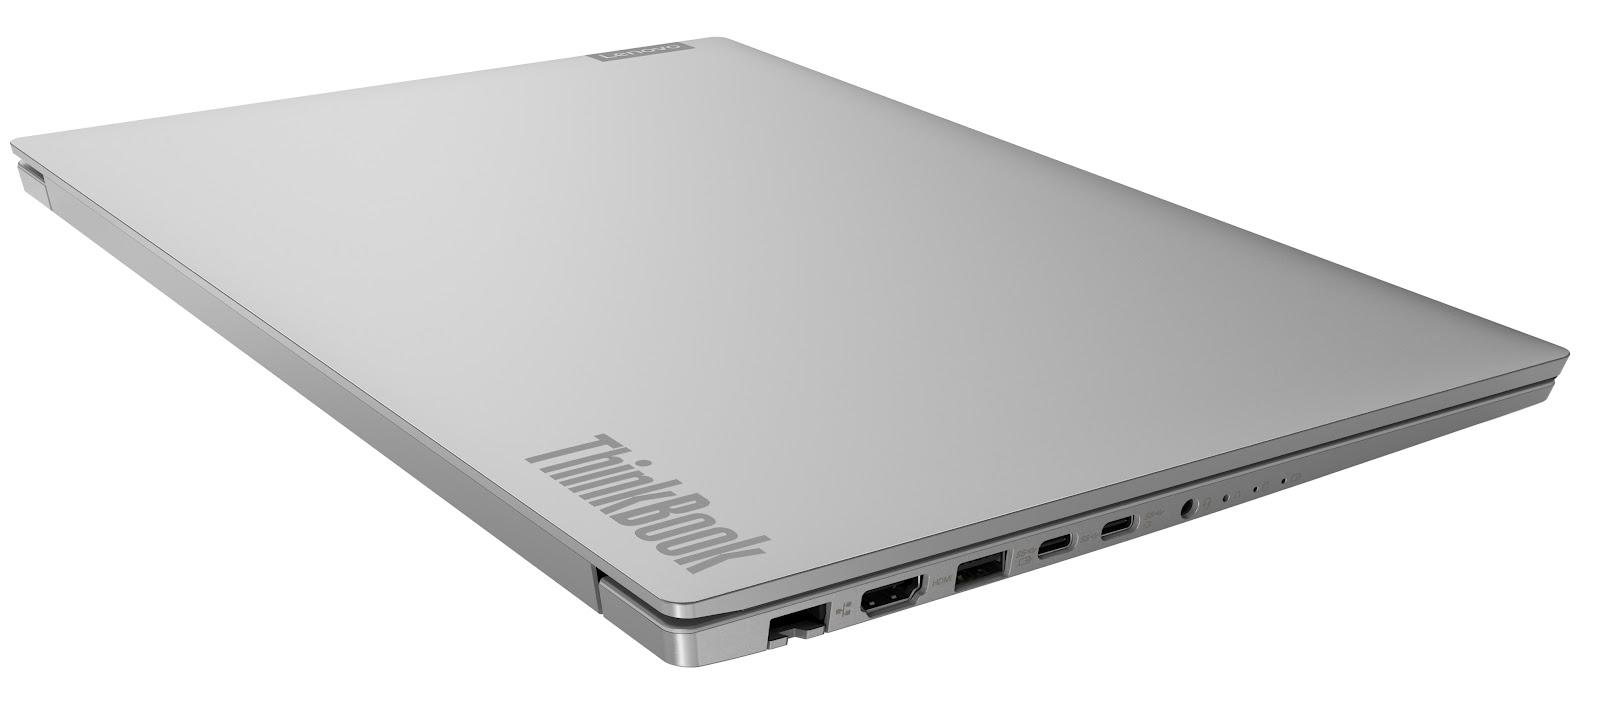 Фото 3. Ноутбук Lenovo ThinkBook 15-IIL (20SM0042RU)